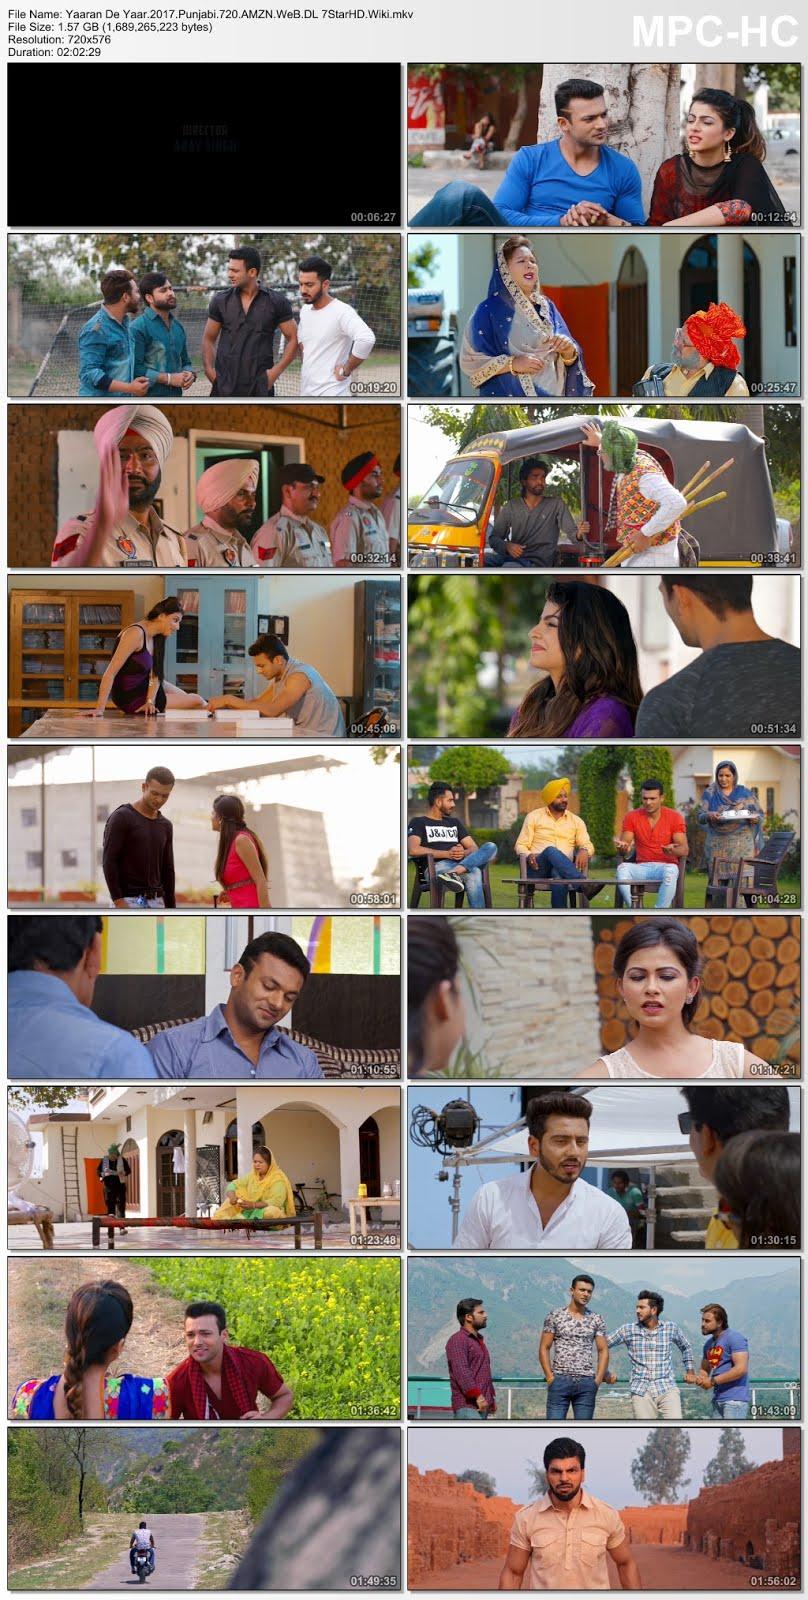 Screen Shot Of Yaaran De Yaar 2017 Full Movie Free Download HD 720P Watch Online